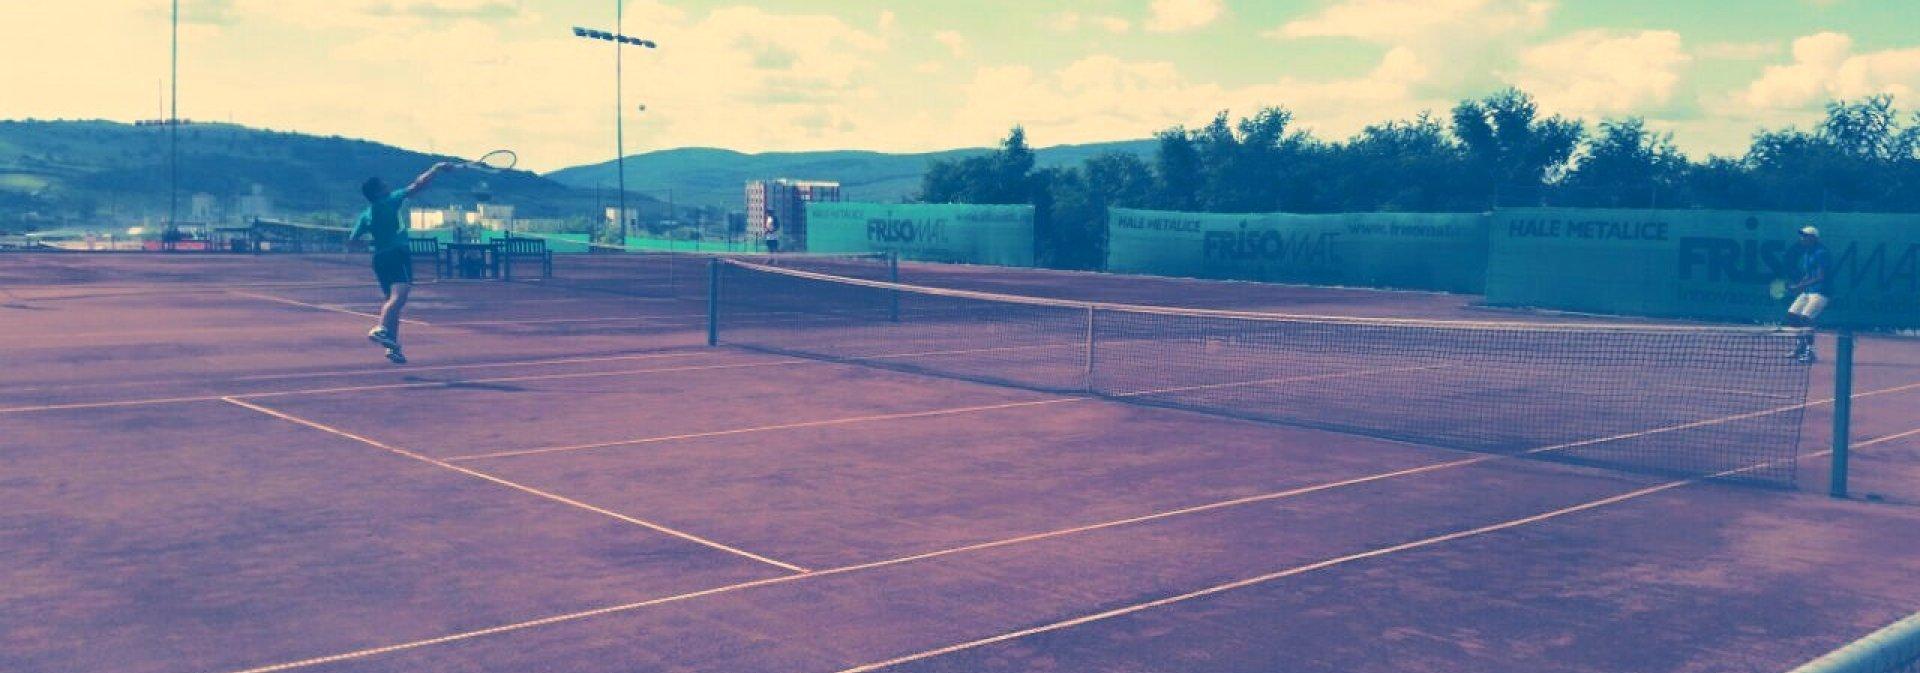 Hoia Tenis Club, Cluj-Napoca, Cluj